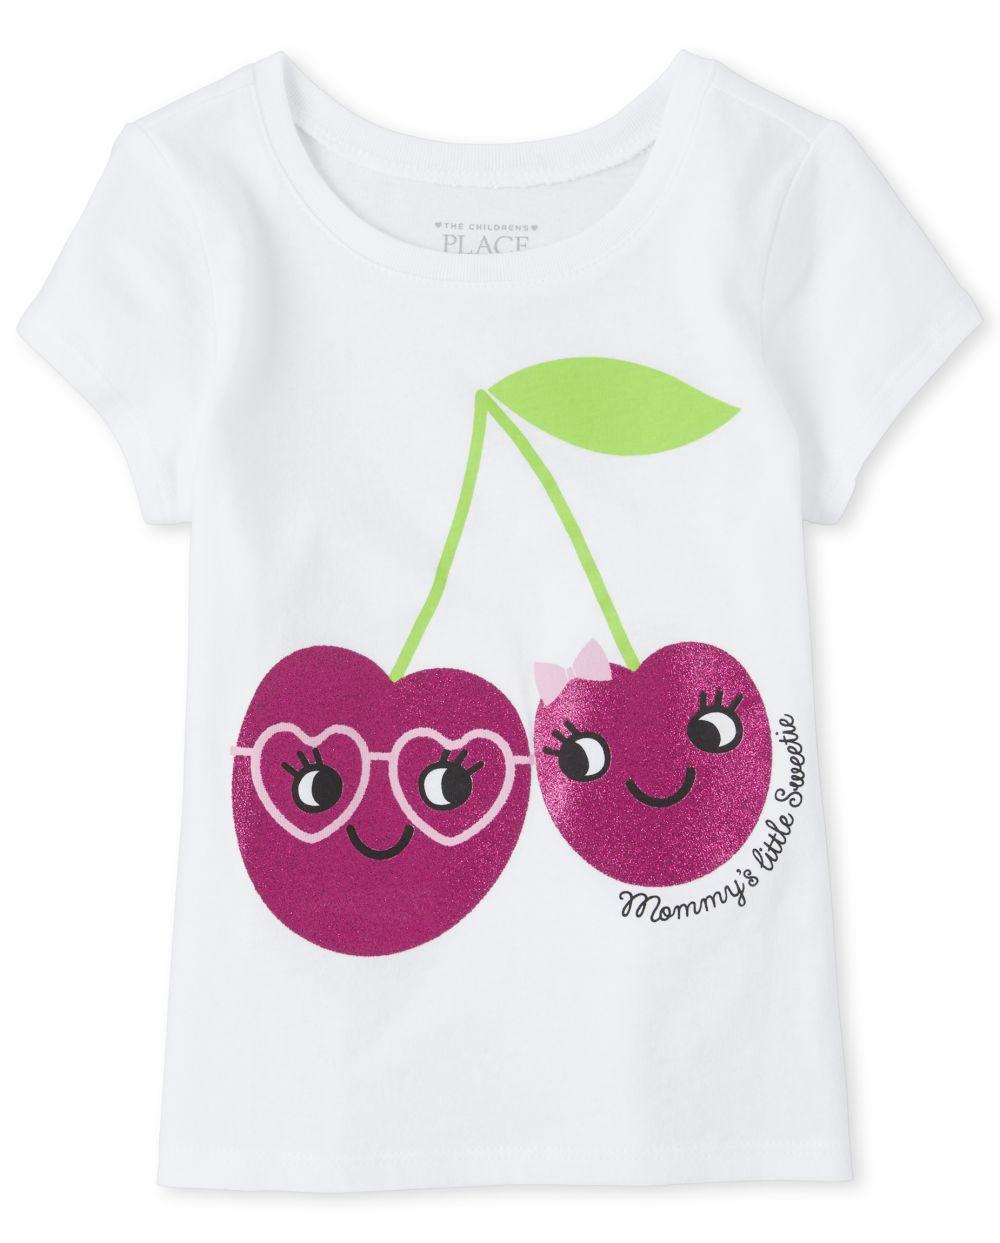 Baby And Toddler Girls Glitter Cherry Graphic Tee